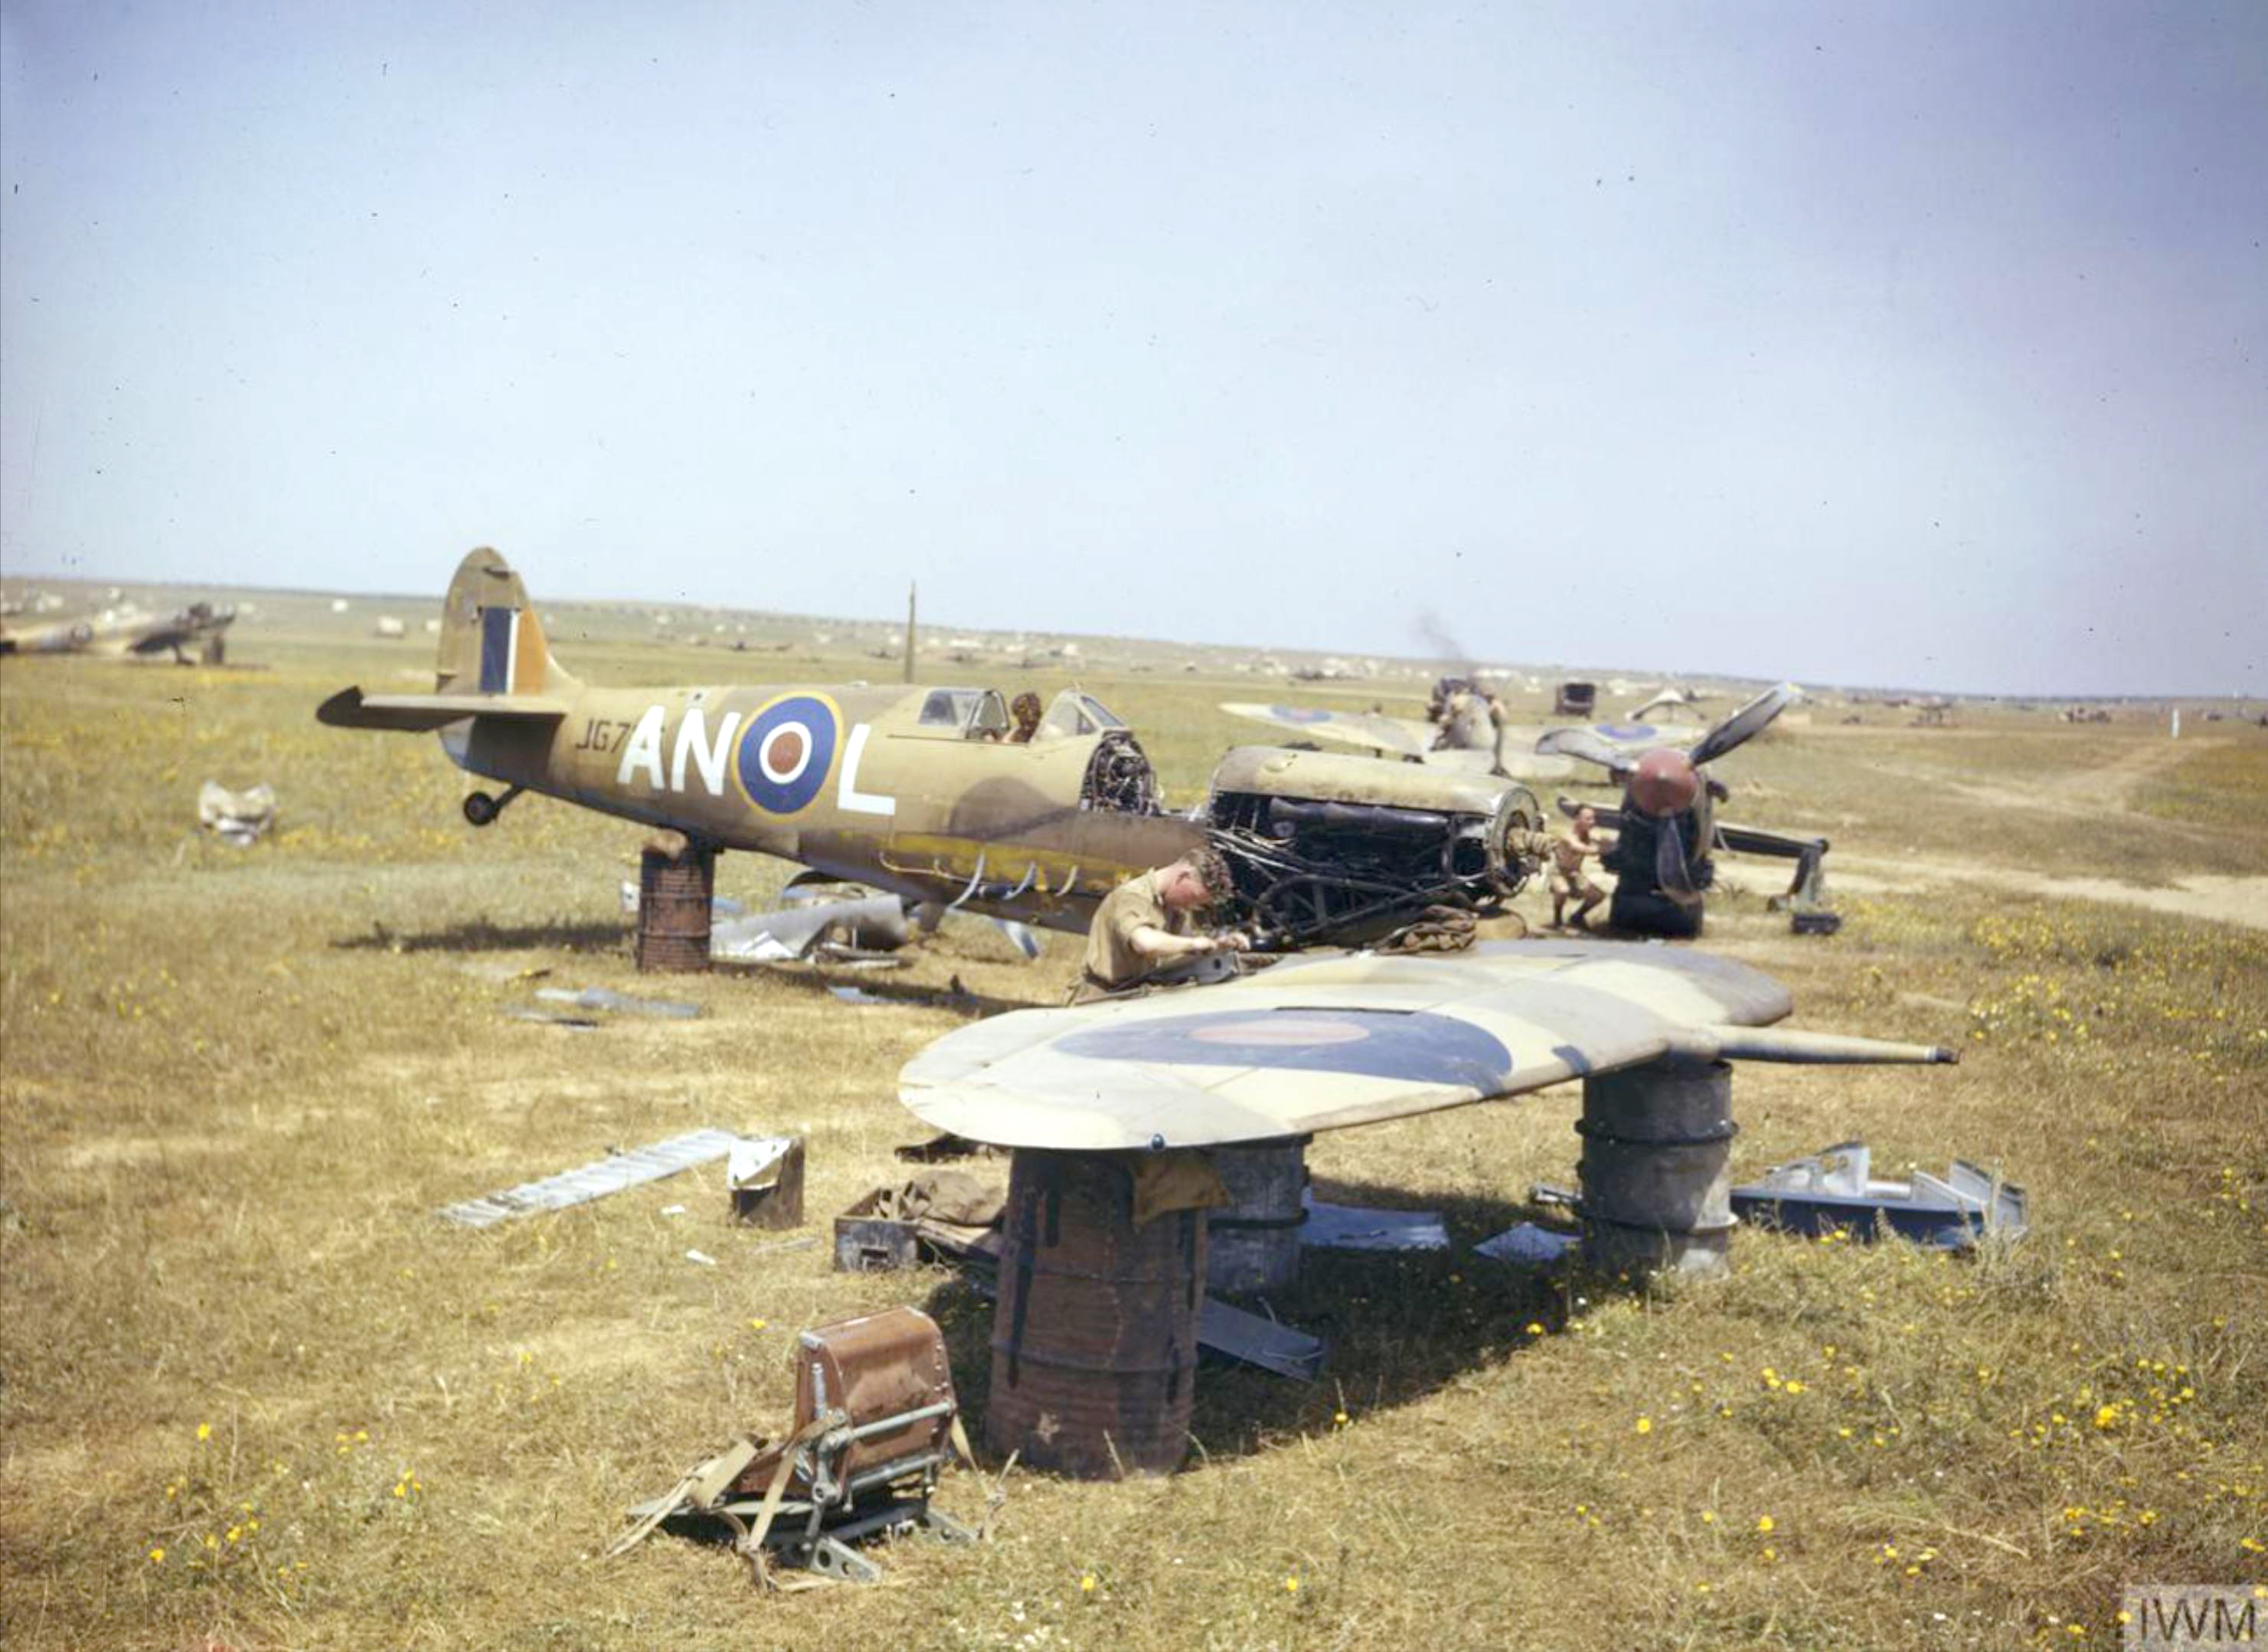 Spitfire MkIX RCAF 417Sqn ANL JG726 at Gabes Tunisia 19 Apr 1943 IWM TR1009